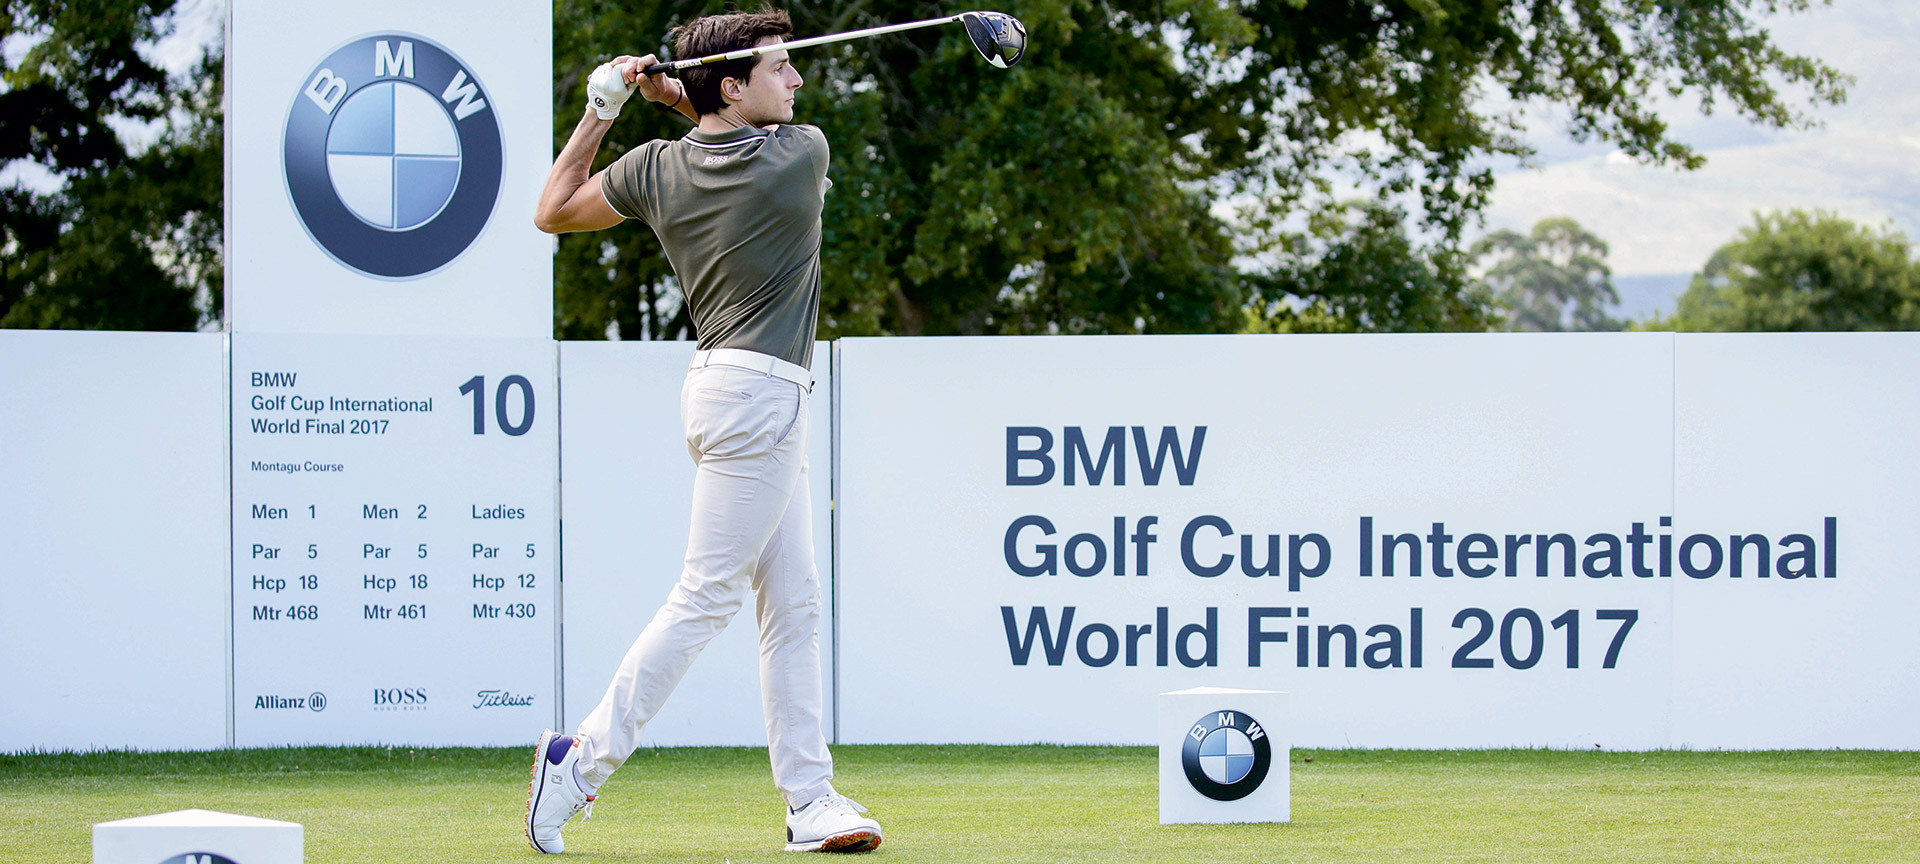 Golf Cup International News Discover Bmw